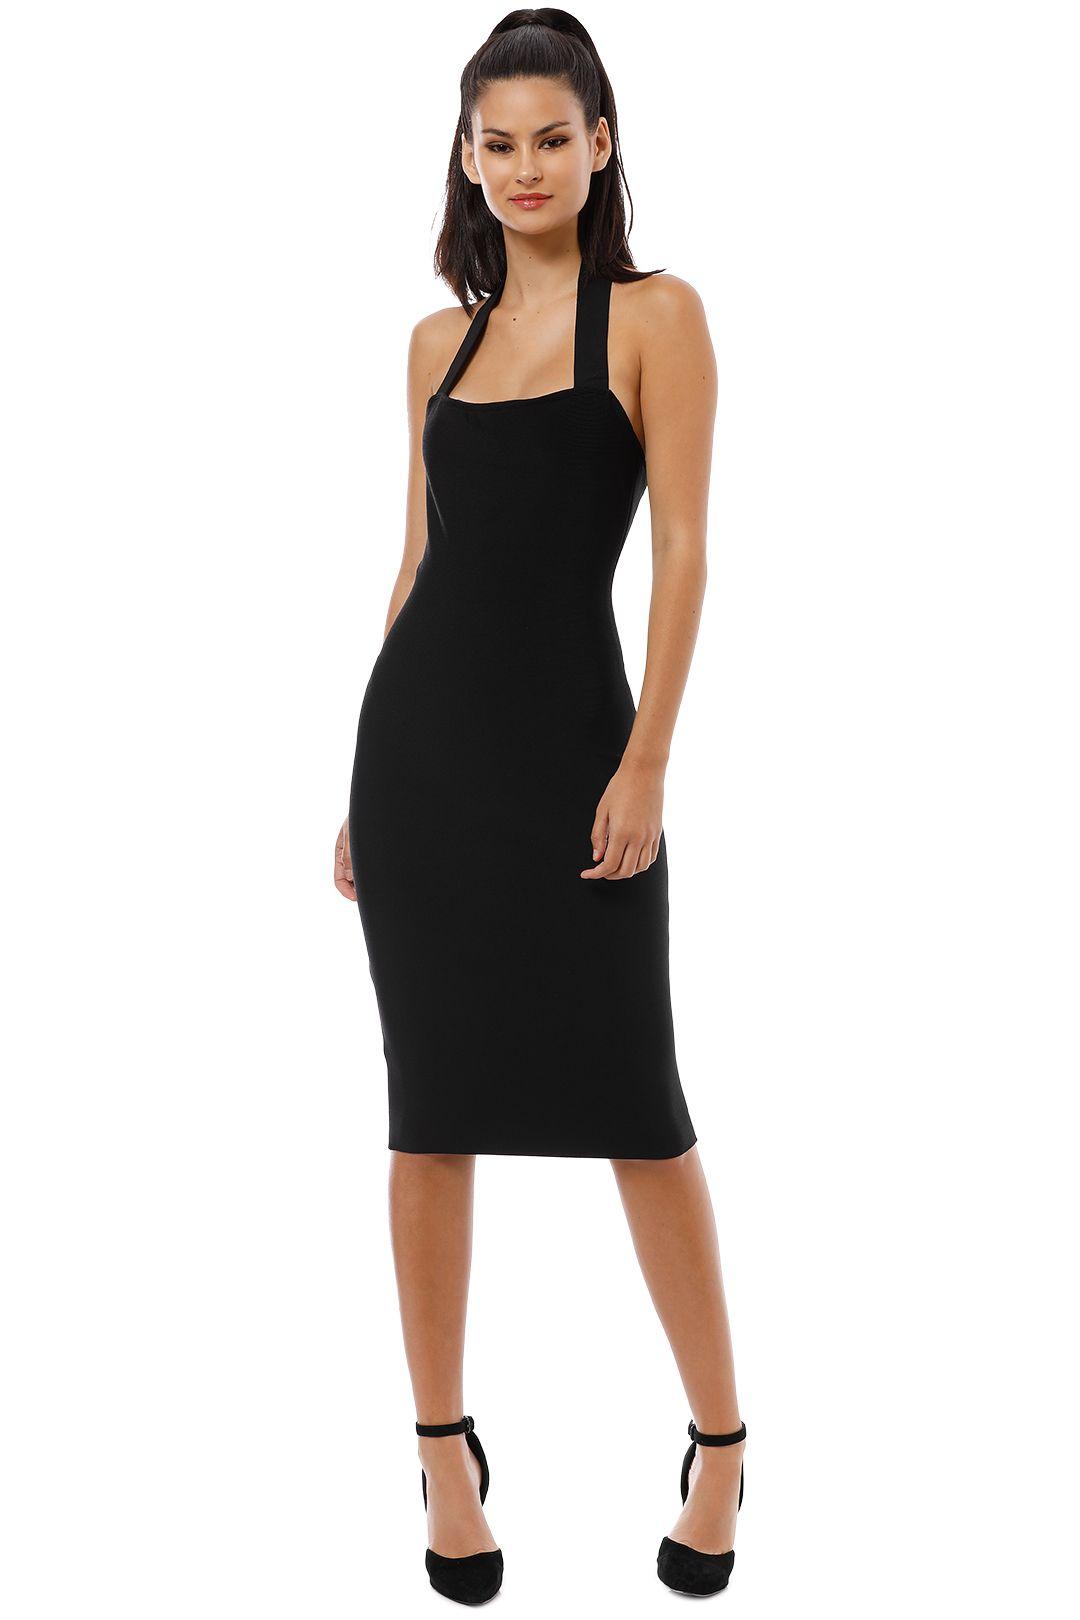 Misha Collection - Julia Midi Dress - Black - Front